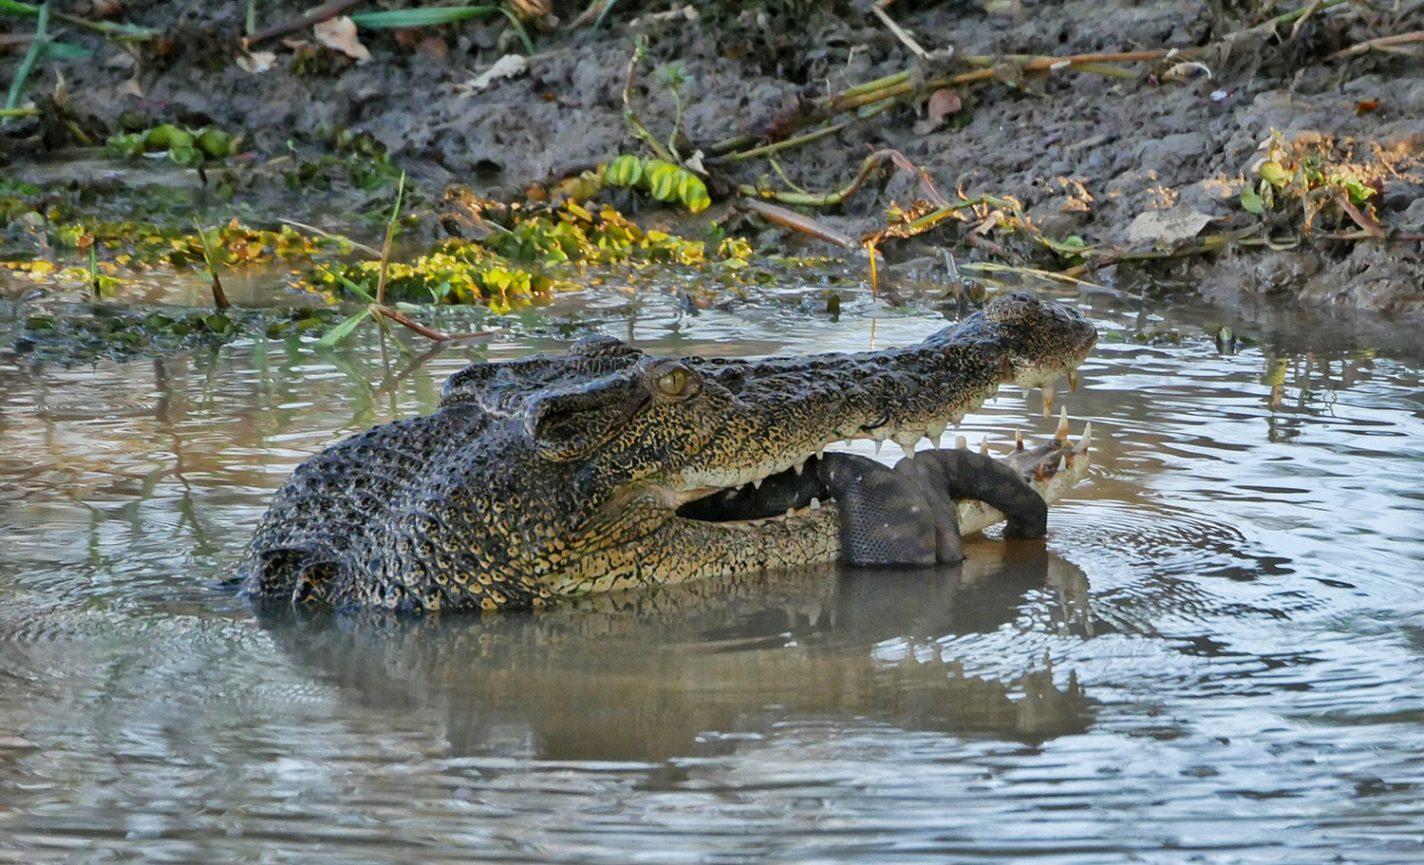 Krokodil met zijn vangst vandaag - een enorme waterslang - Kakadu National Park